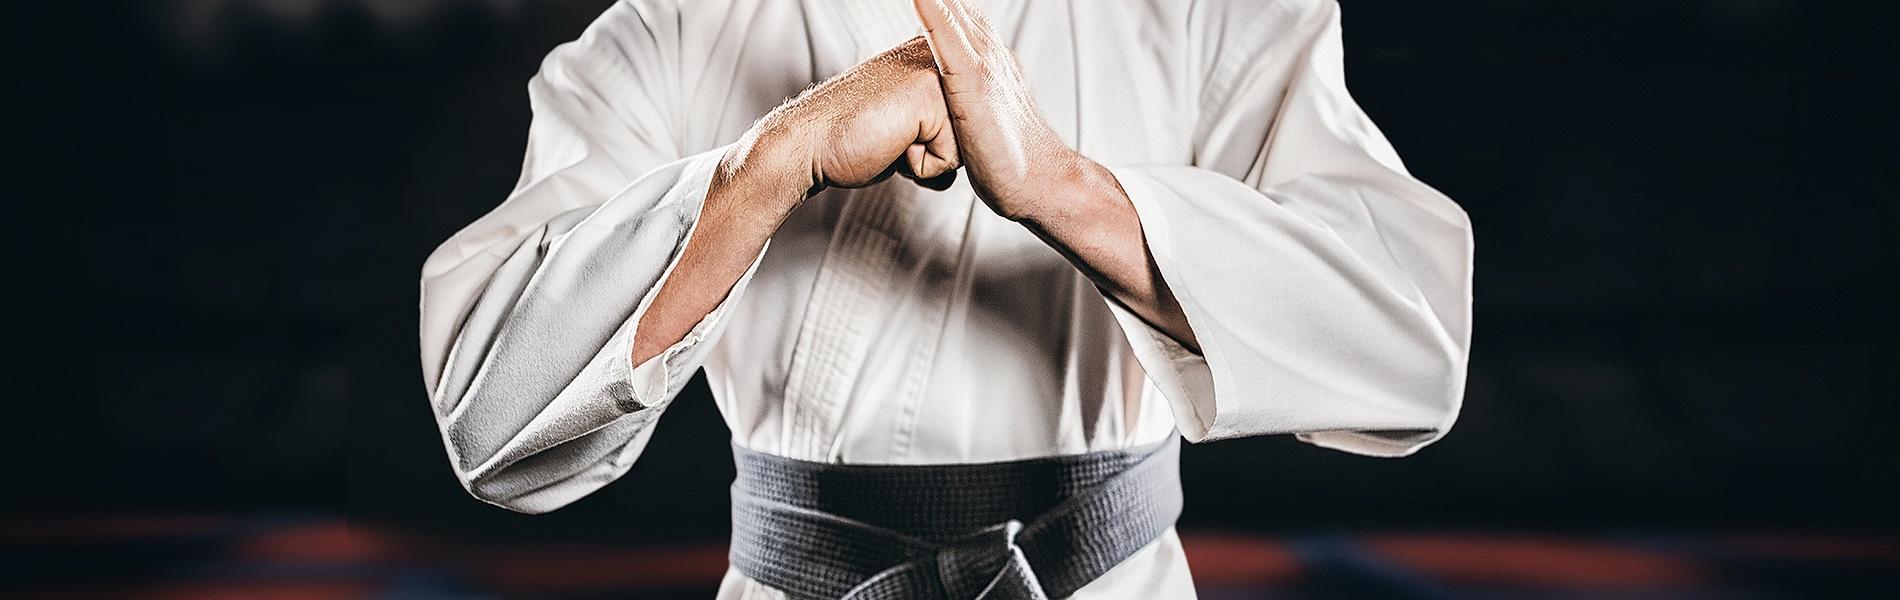 5 Affordable Martial Arts Marketing Ideas